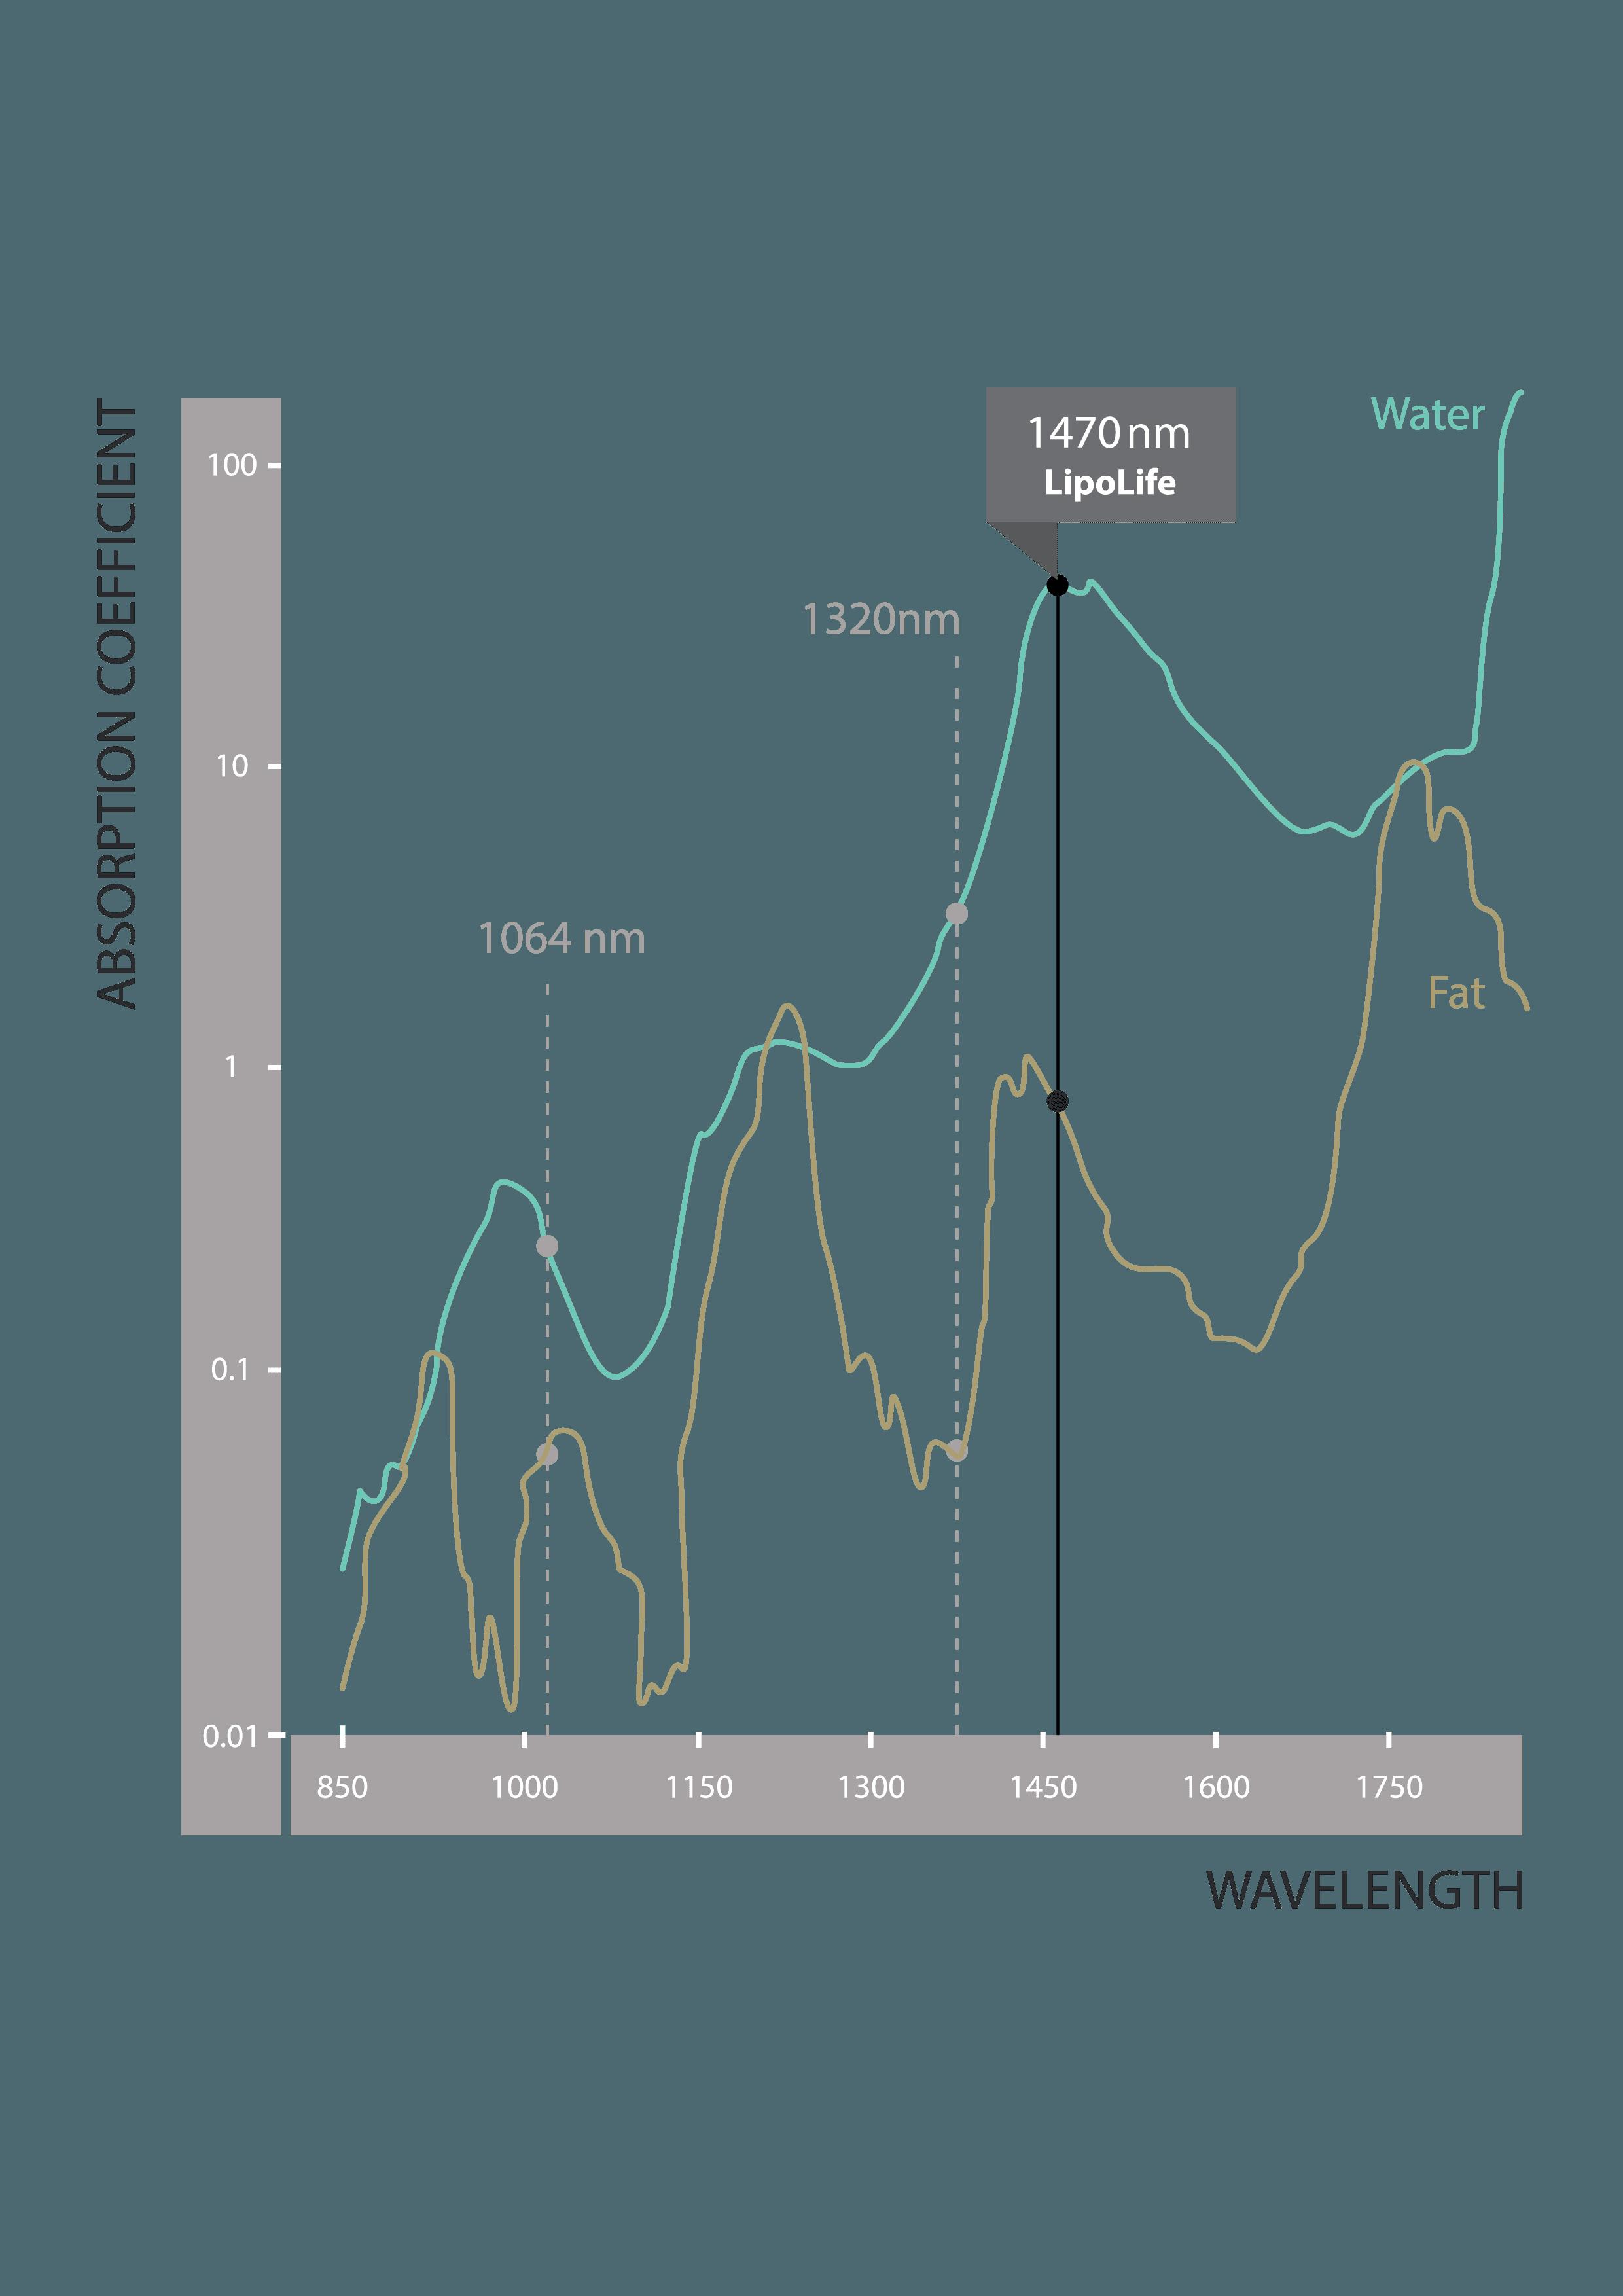 LipoLife absorption graph